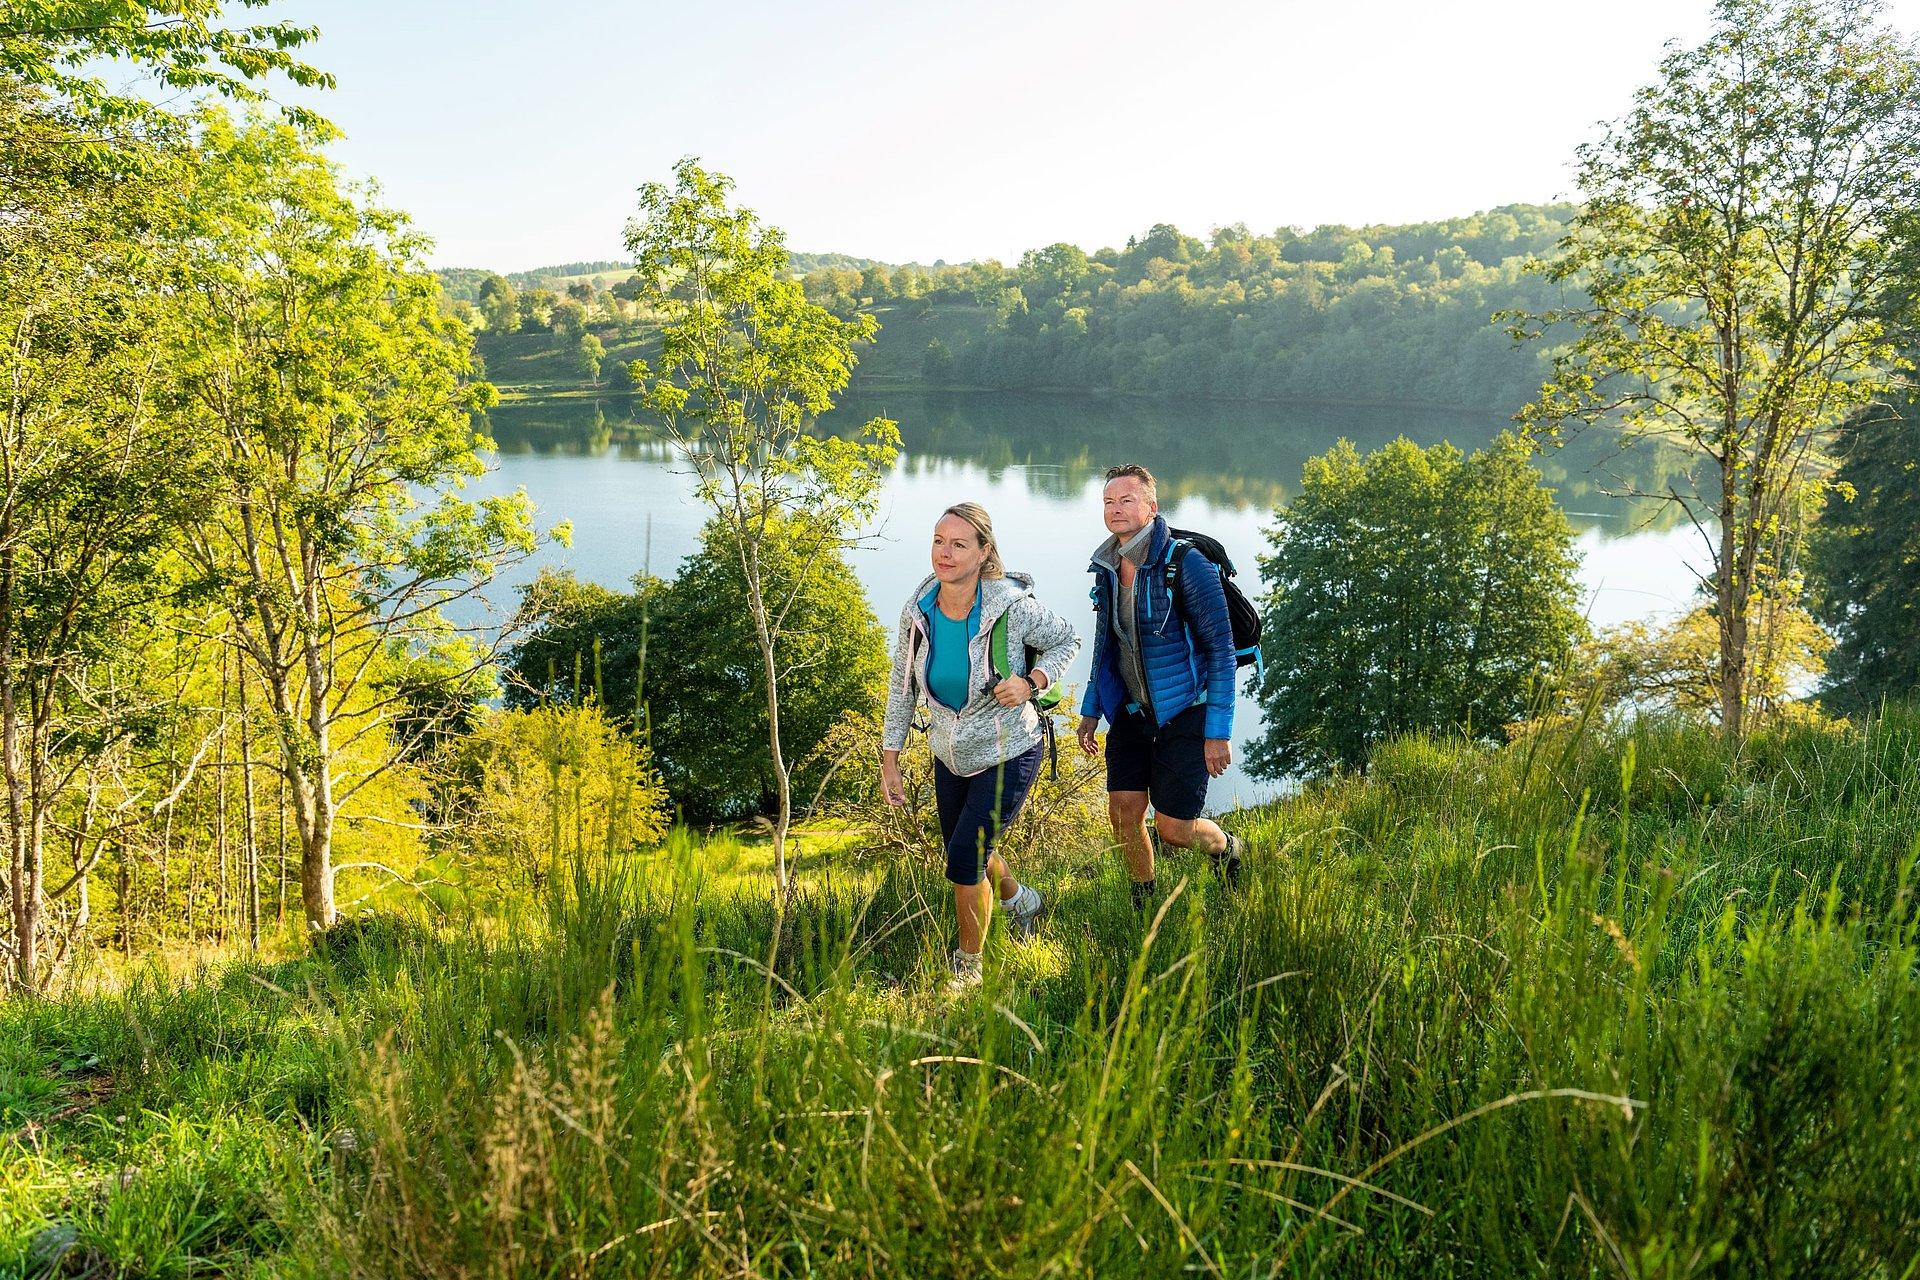 Wandelaars op de Eifelsteig langs de Weinfelder Maar, Eifel